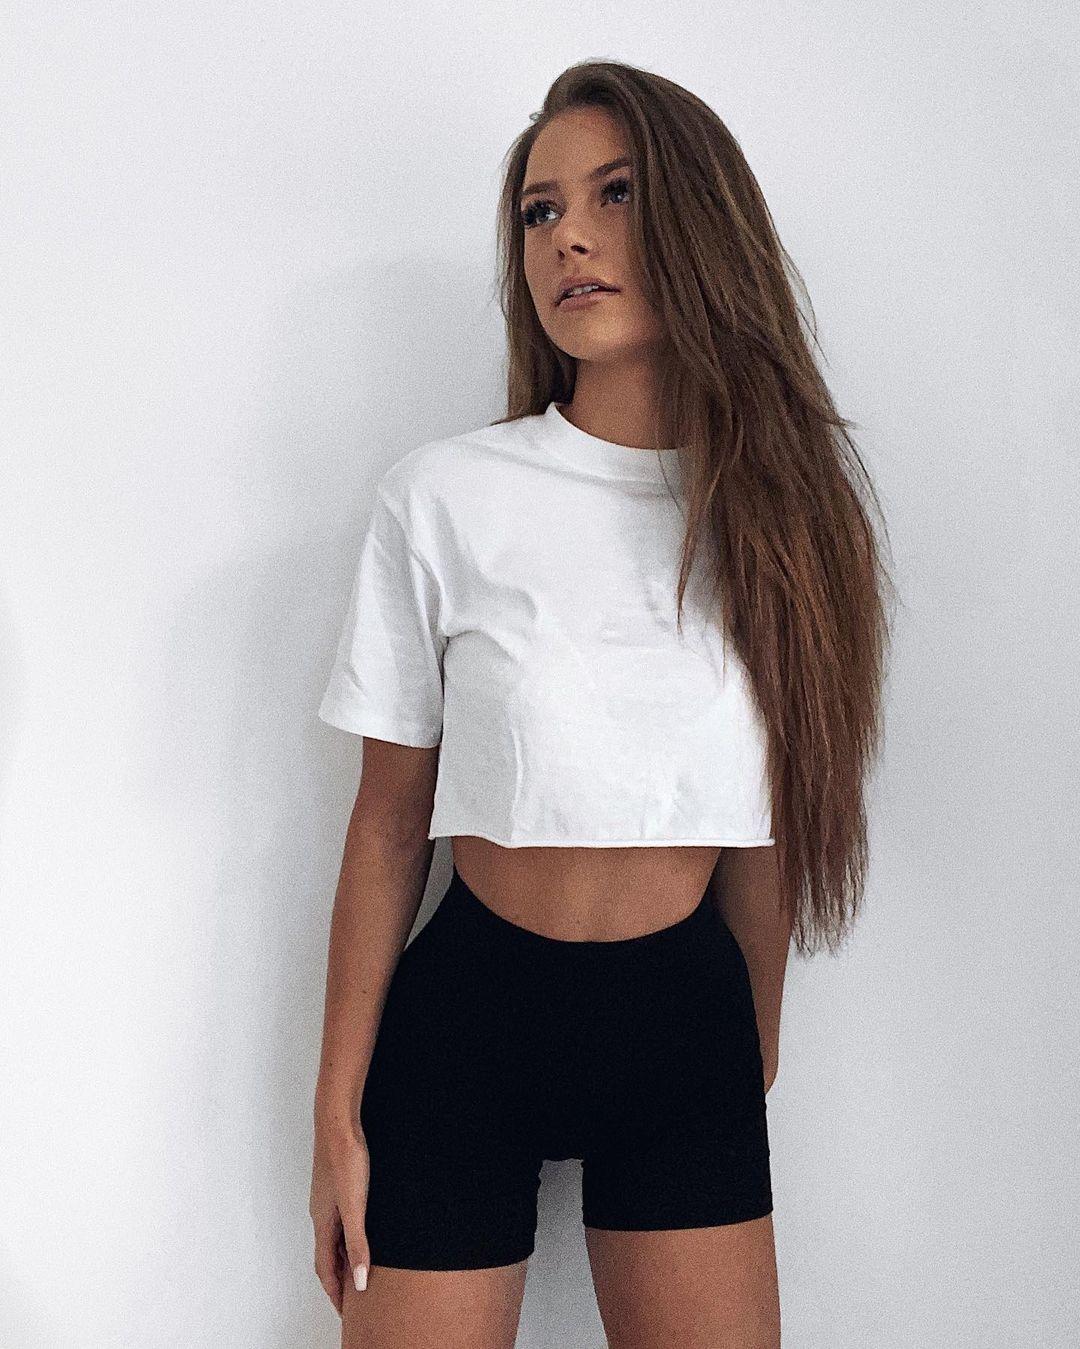 Emilia-Bte-Wallpapers-Insta-Fit-Bio-5